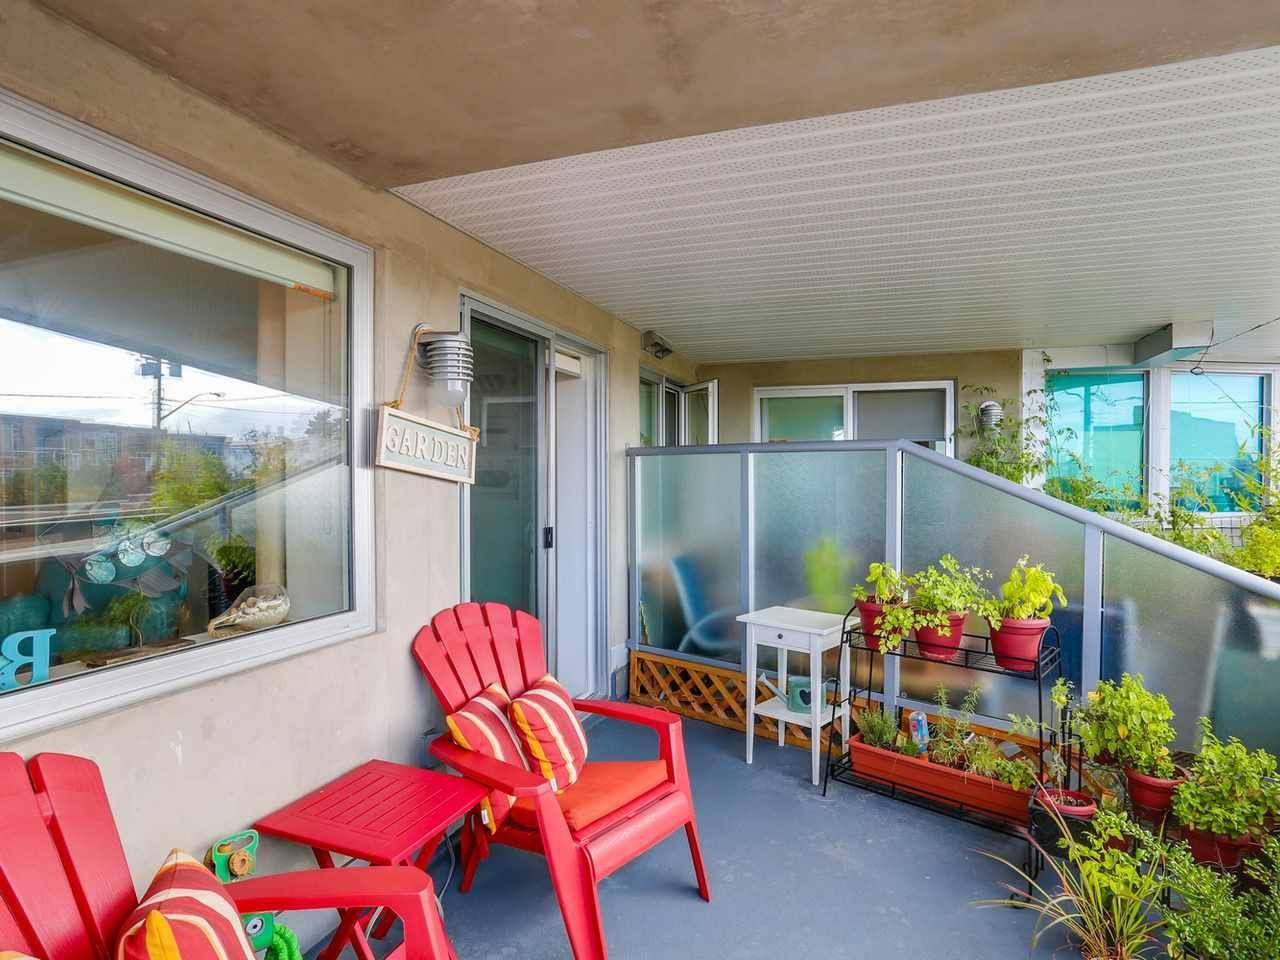 "Photo 15: Photos: 202 14955 VICTORIA Avenue: White Rock Condo for sale in ""SAUSALITO BEACH SIDE LIVING"" (South Surrey White Rock)  : MLS®# R2128764"